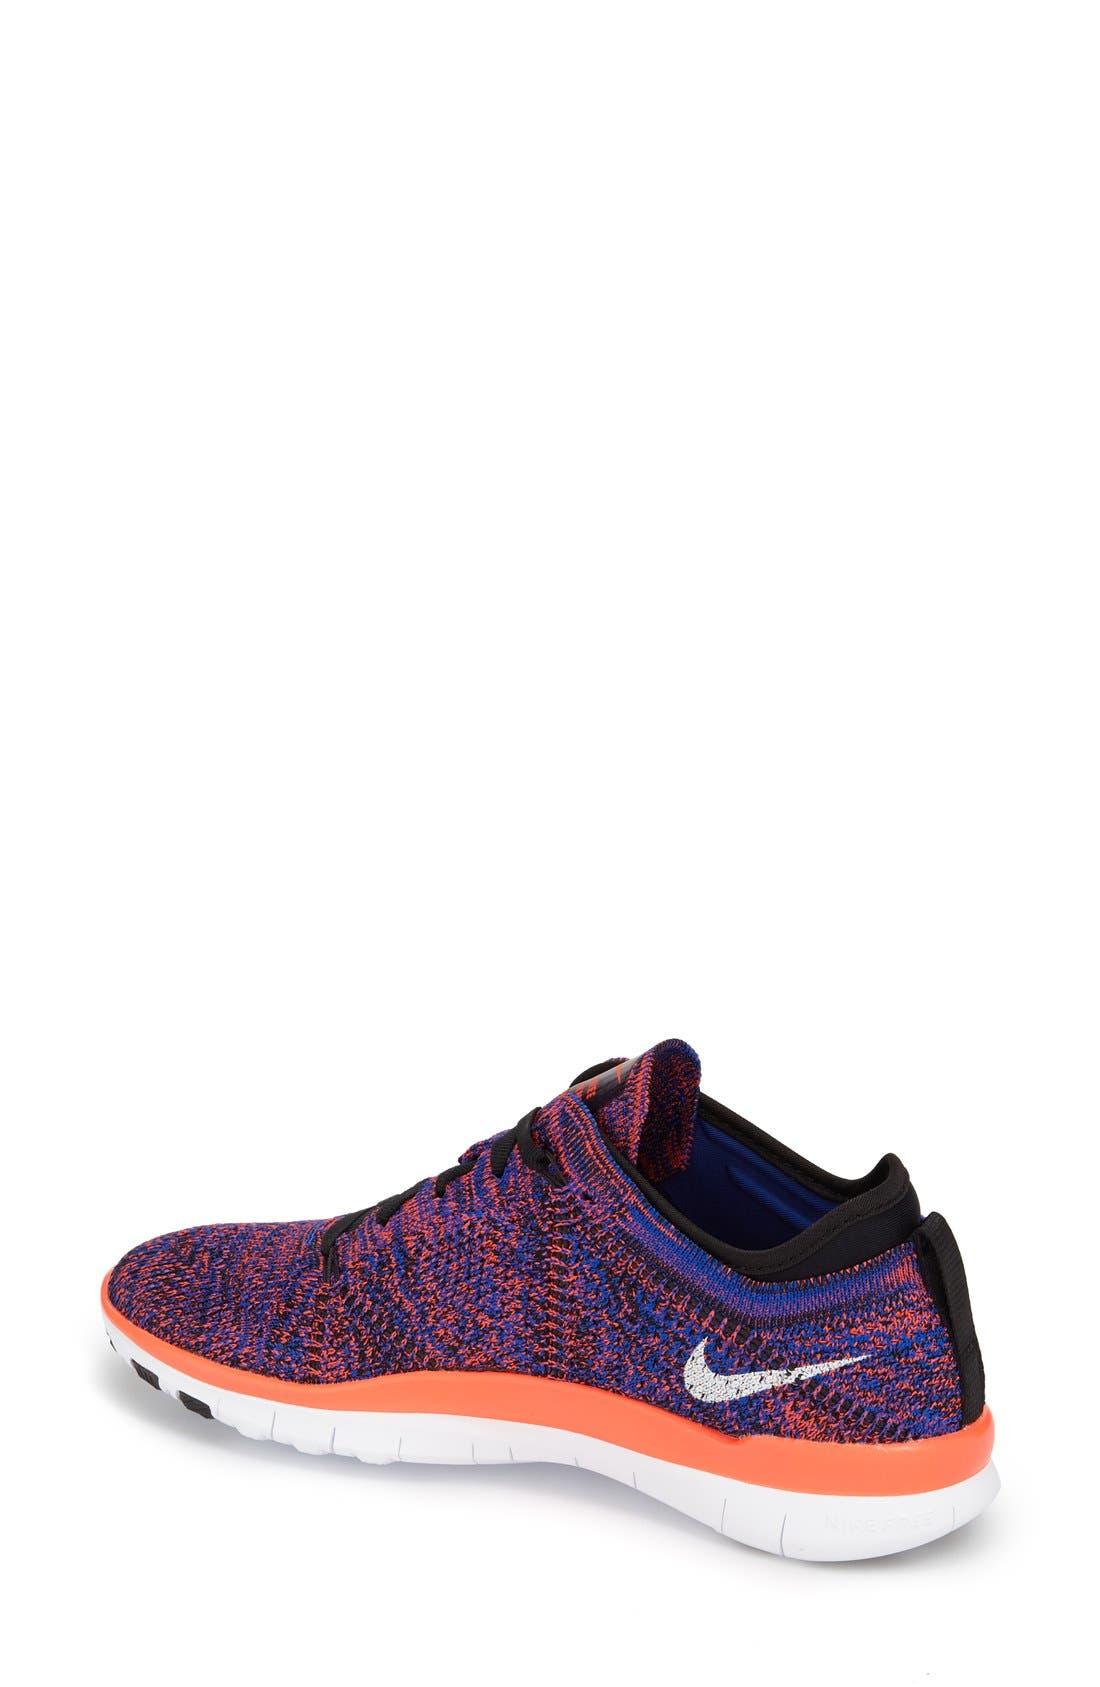 ,                             'Free Flyknit 5.0 TR' Training Shoe,                             Alternate thumbnail 6, color,                             002